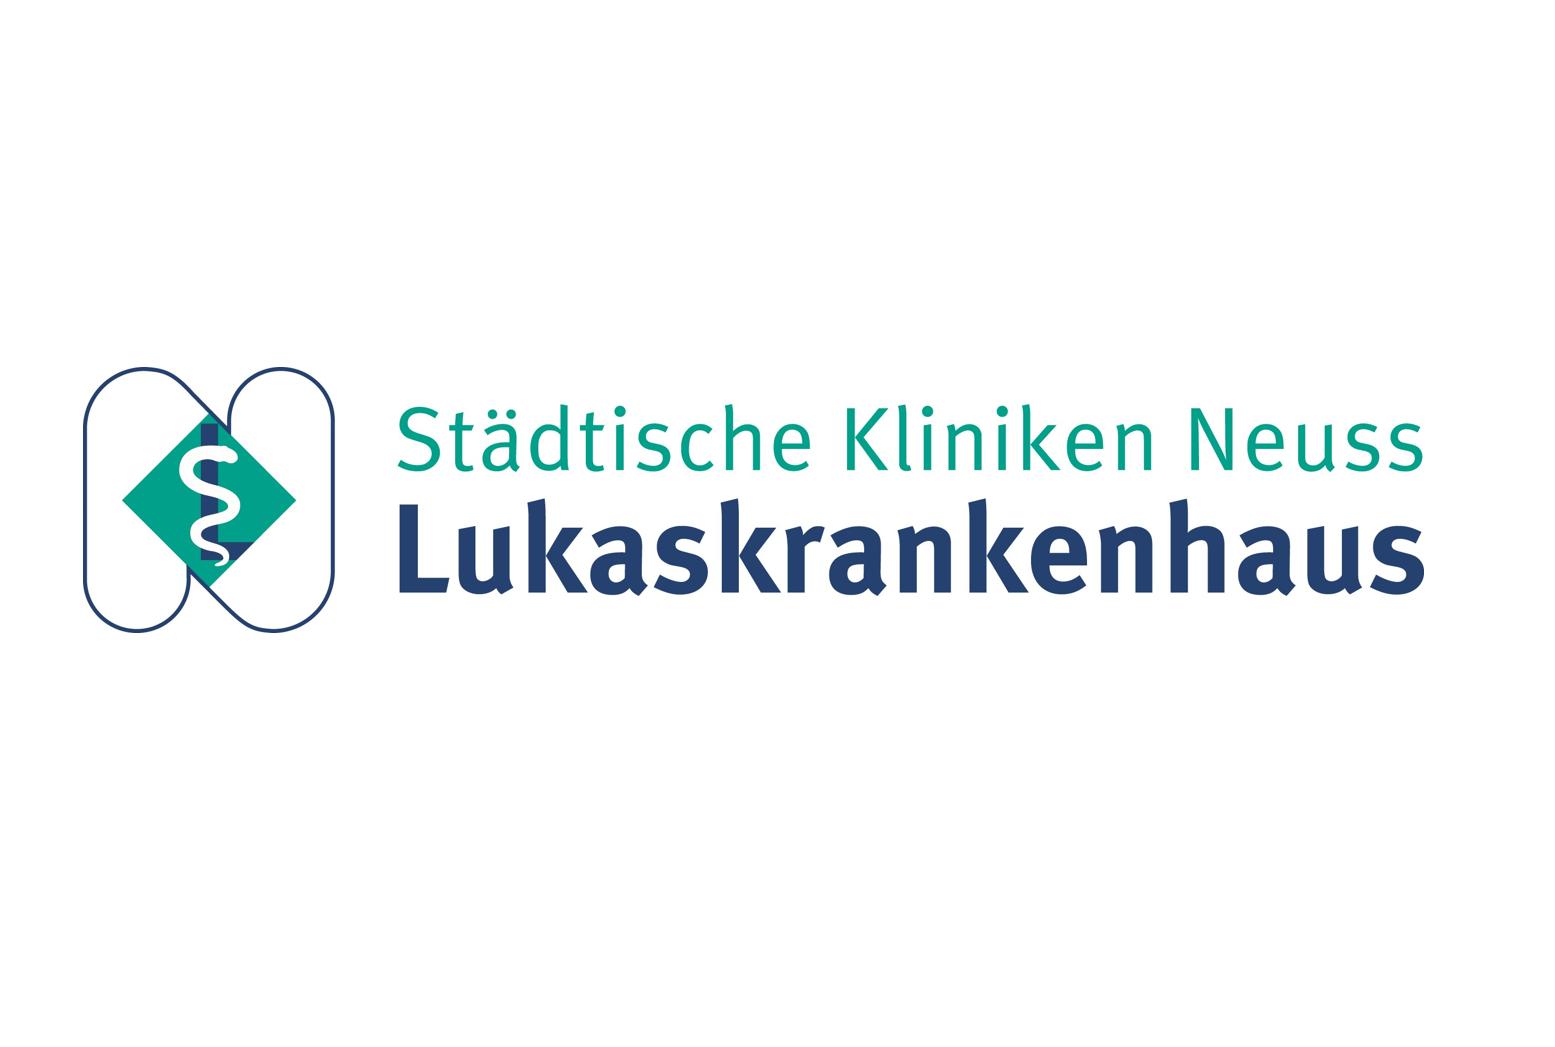 lukaskrankenhaus-150